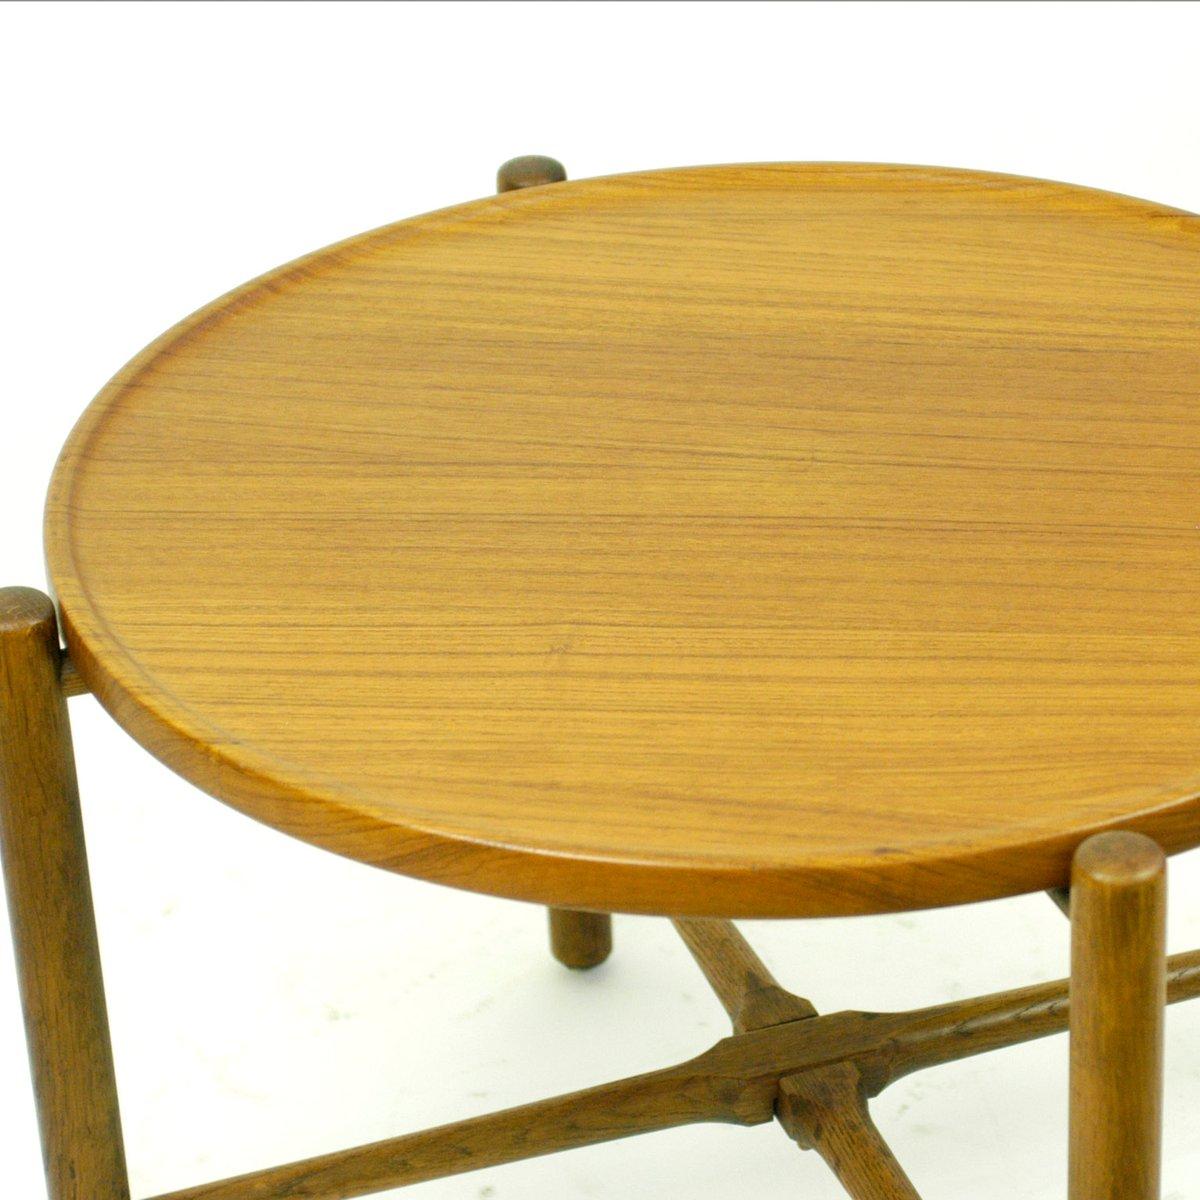 Vintage Danish Teak Coffee Table By Hans Wegner For Andreas Tuck